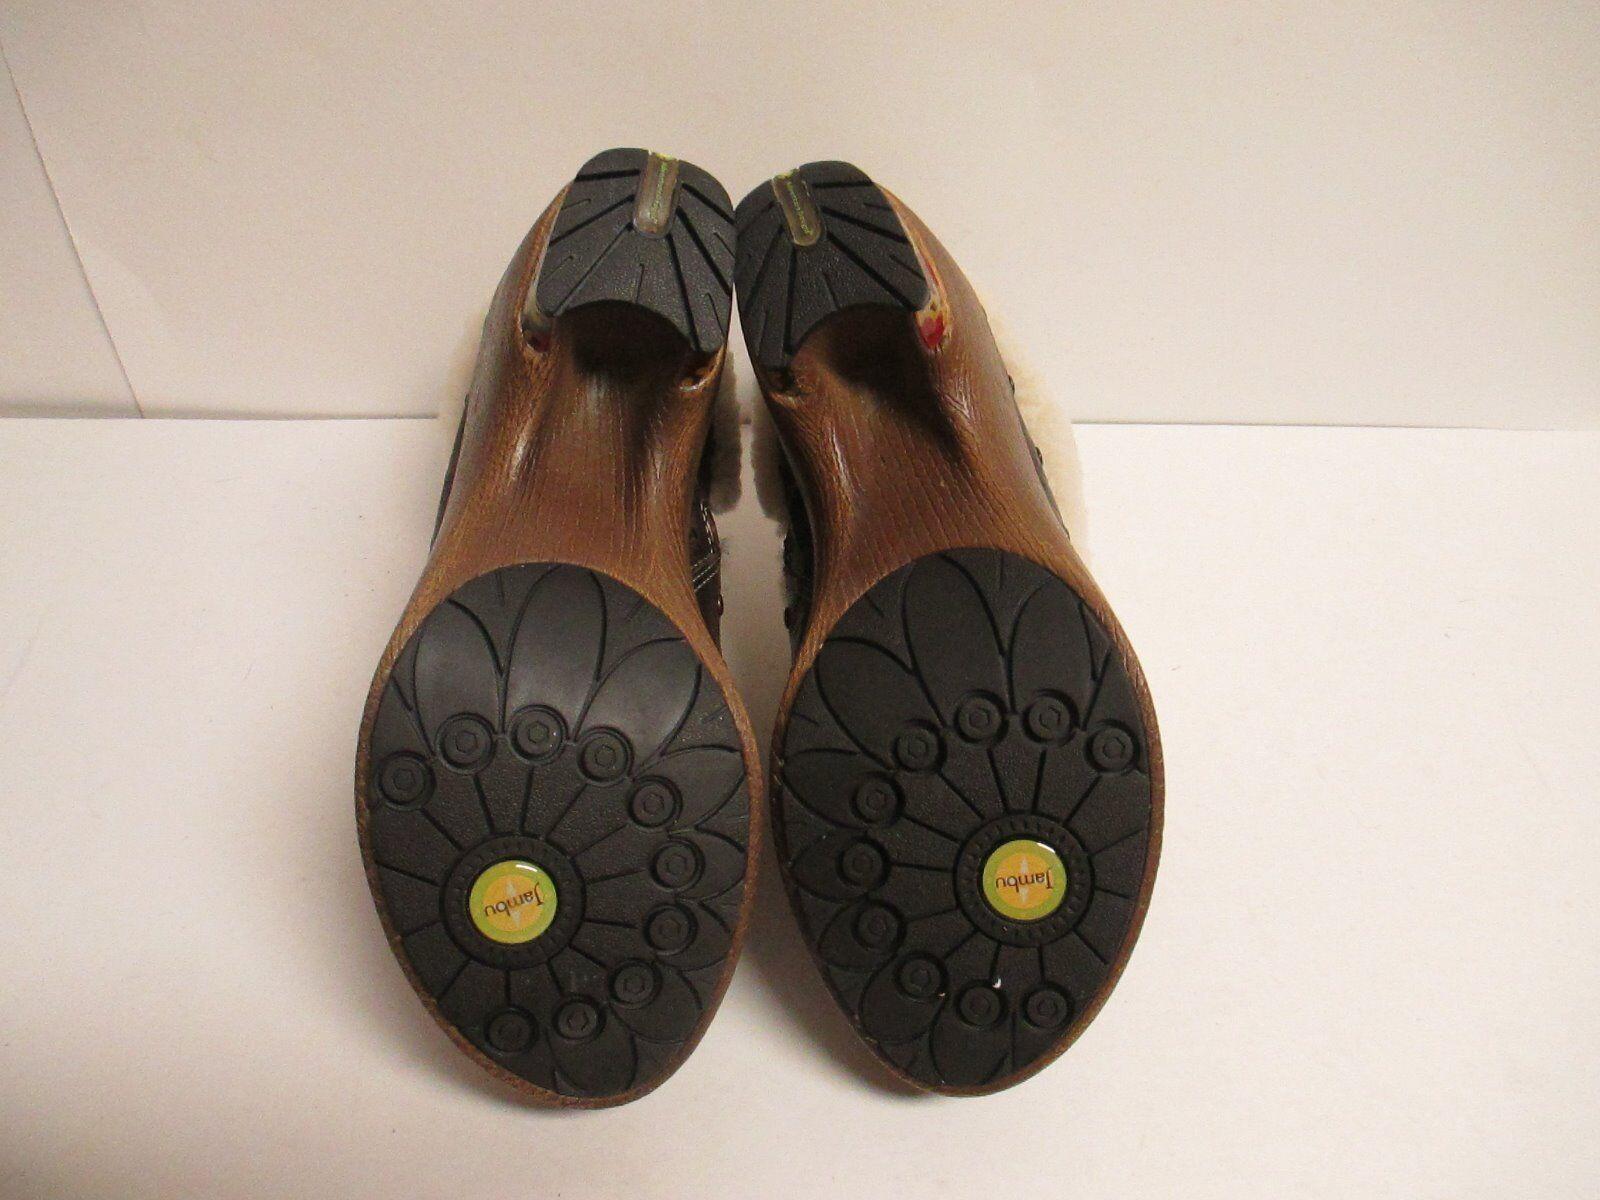 Jambu Holland Ankle Stiefel Stiefel Stiefel 6 M braun Leather New with Box fdf380